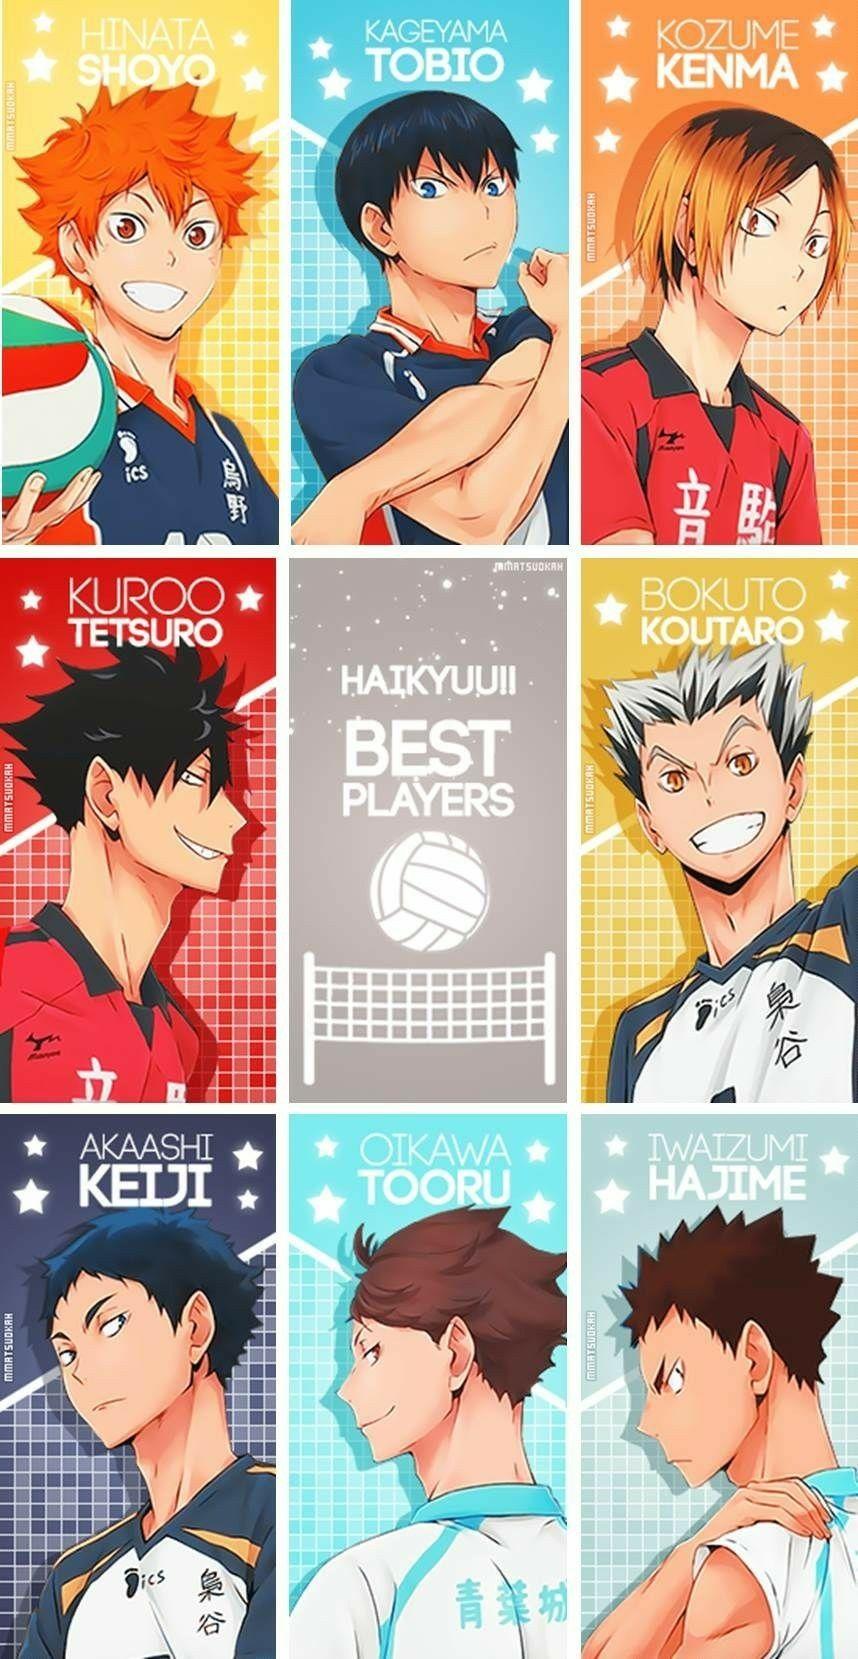 Haikyuu Best Players Haikyuu Anime Haikyuu Anime